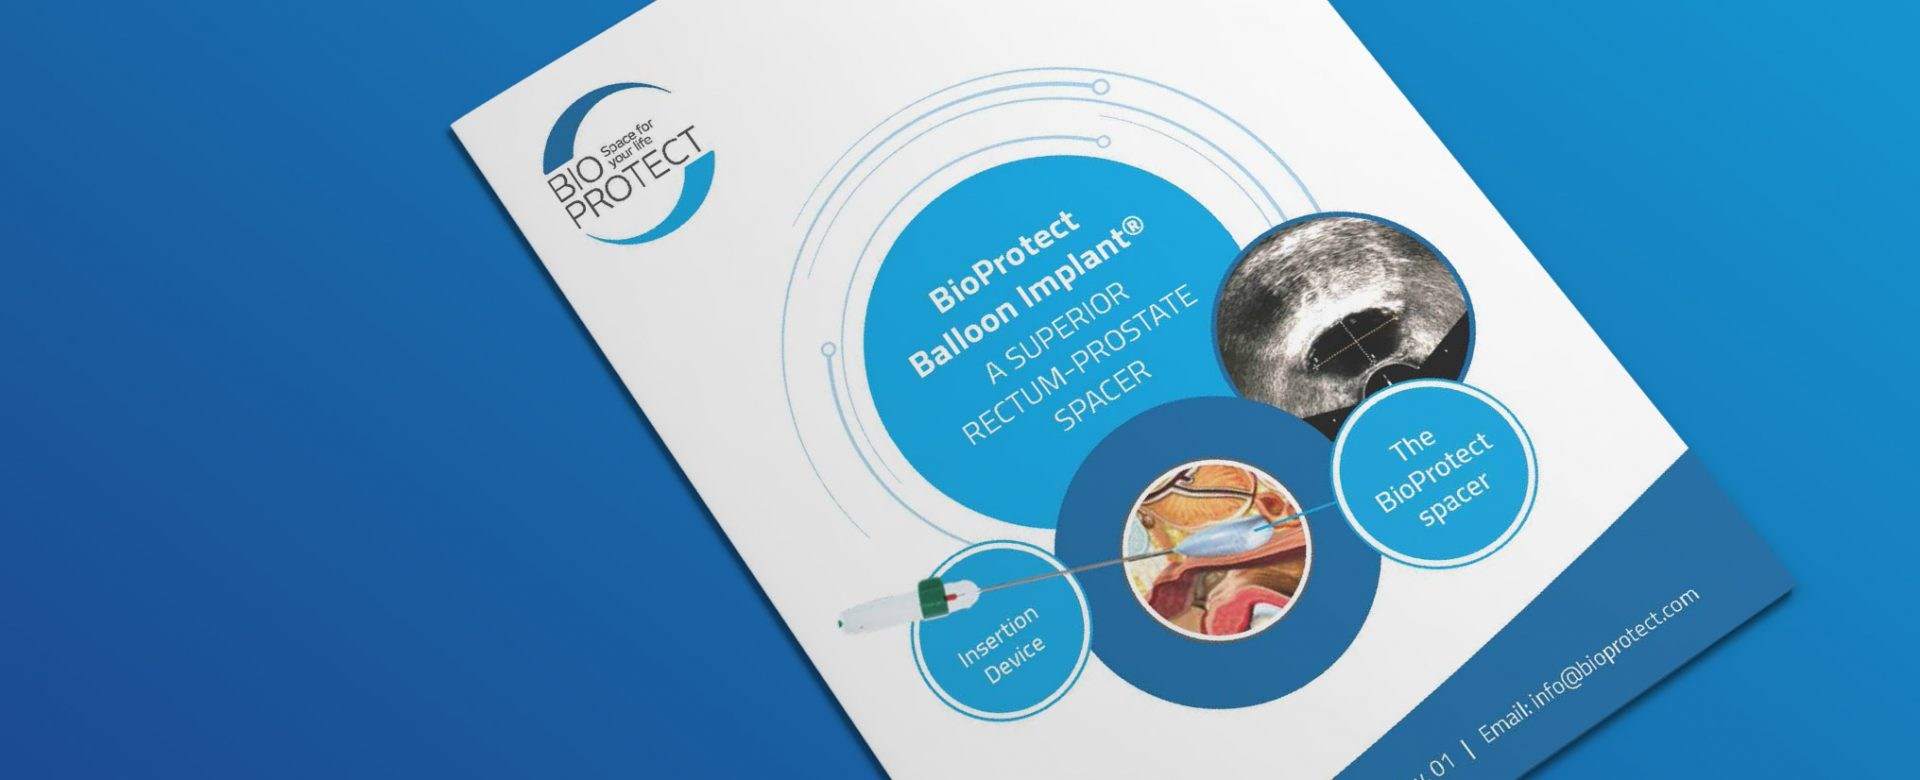 Bioprotect brochure